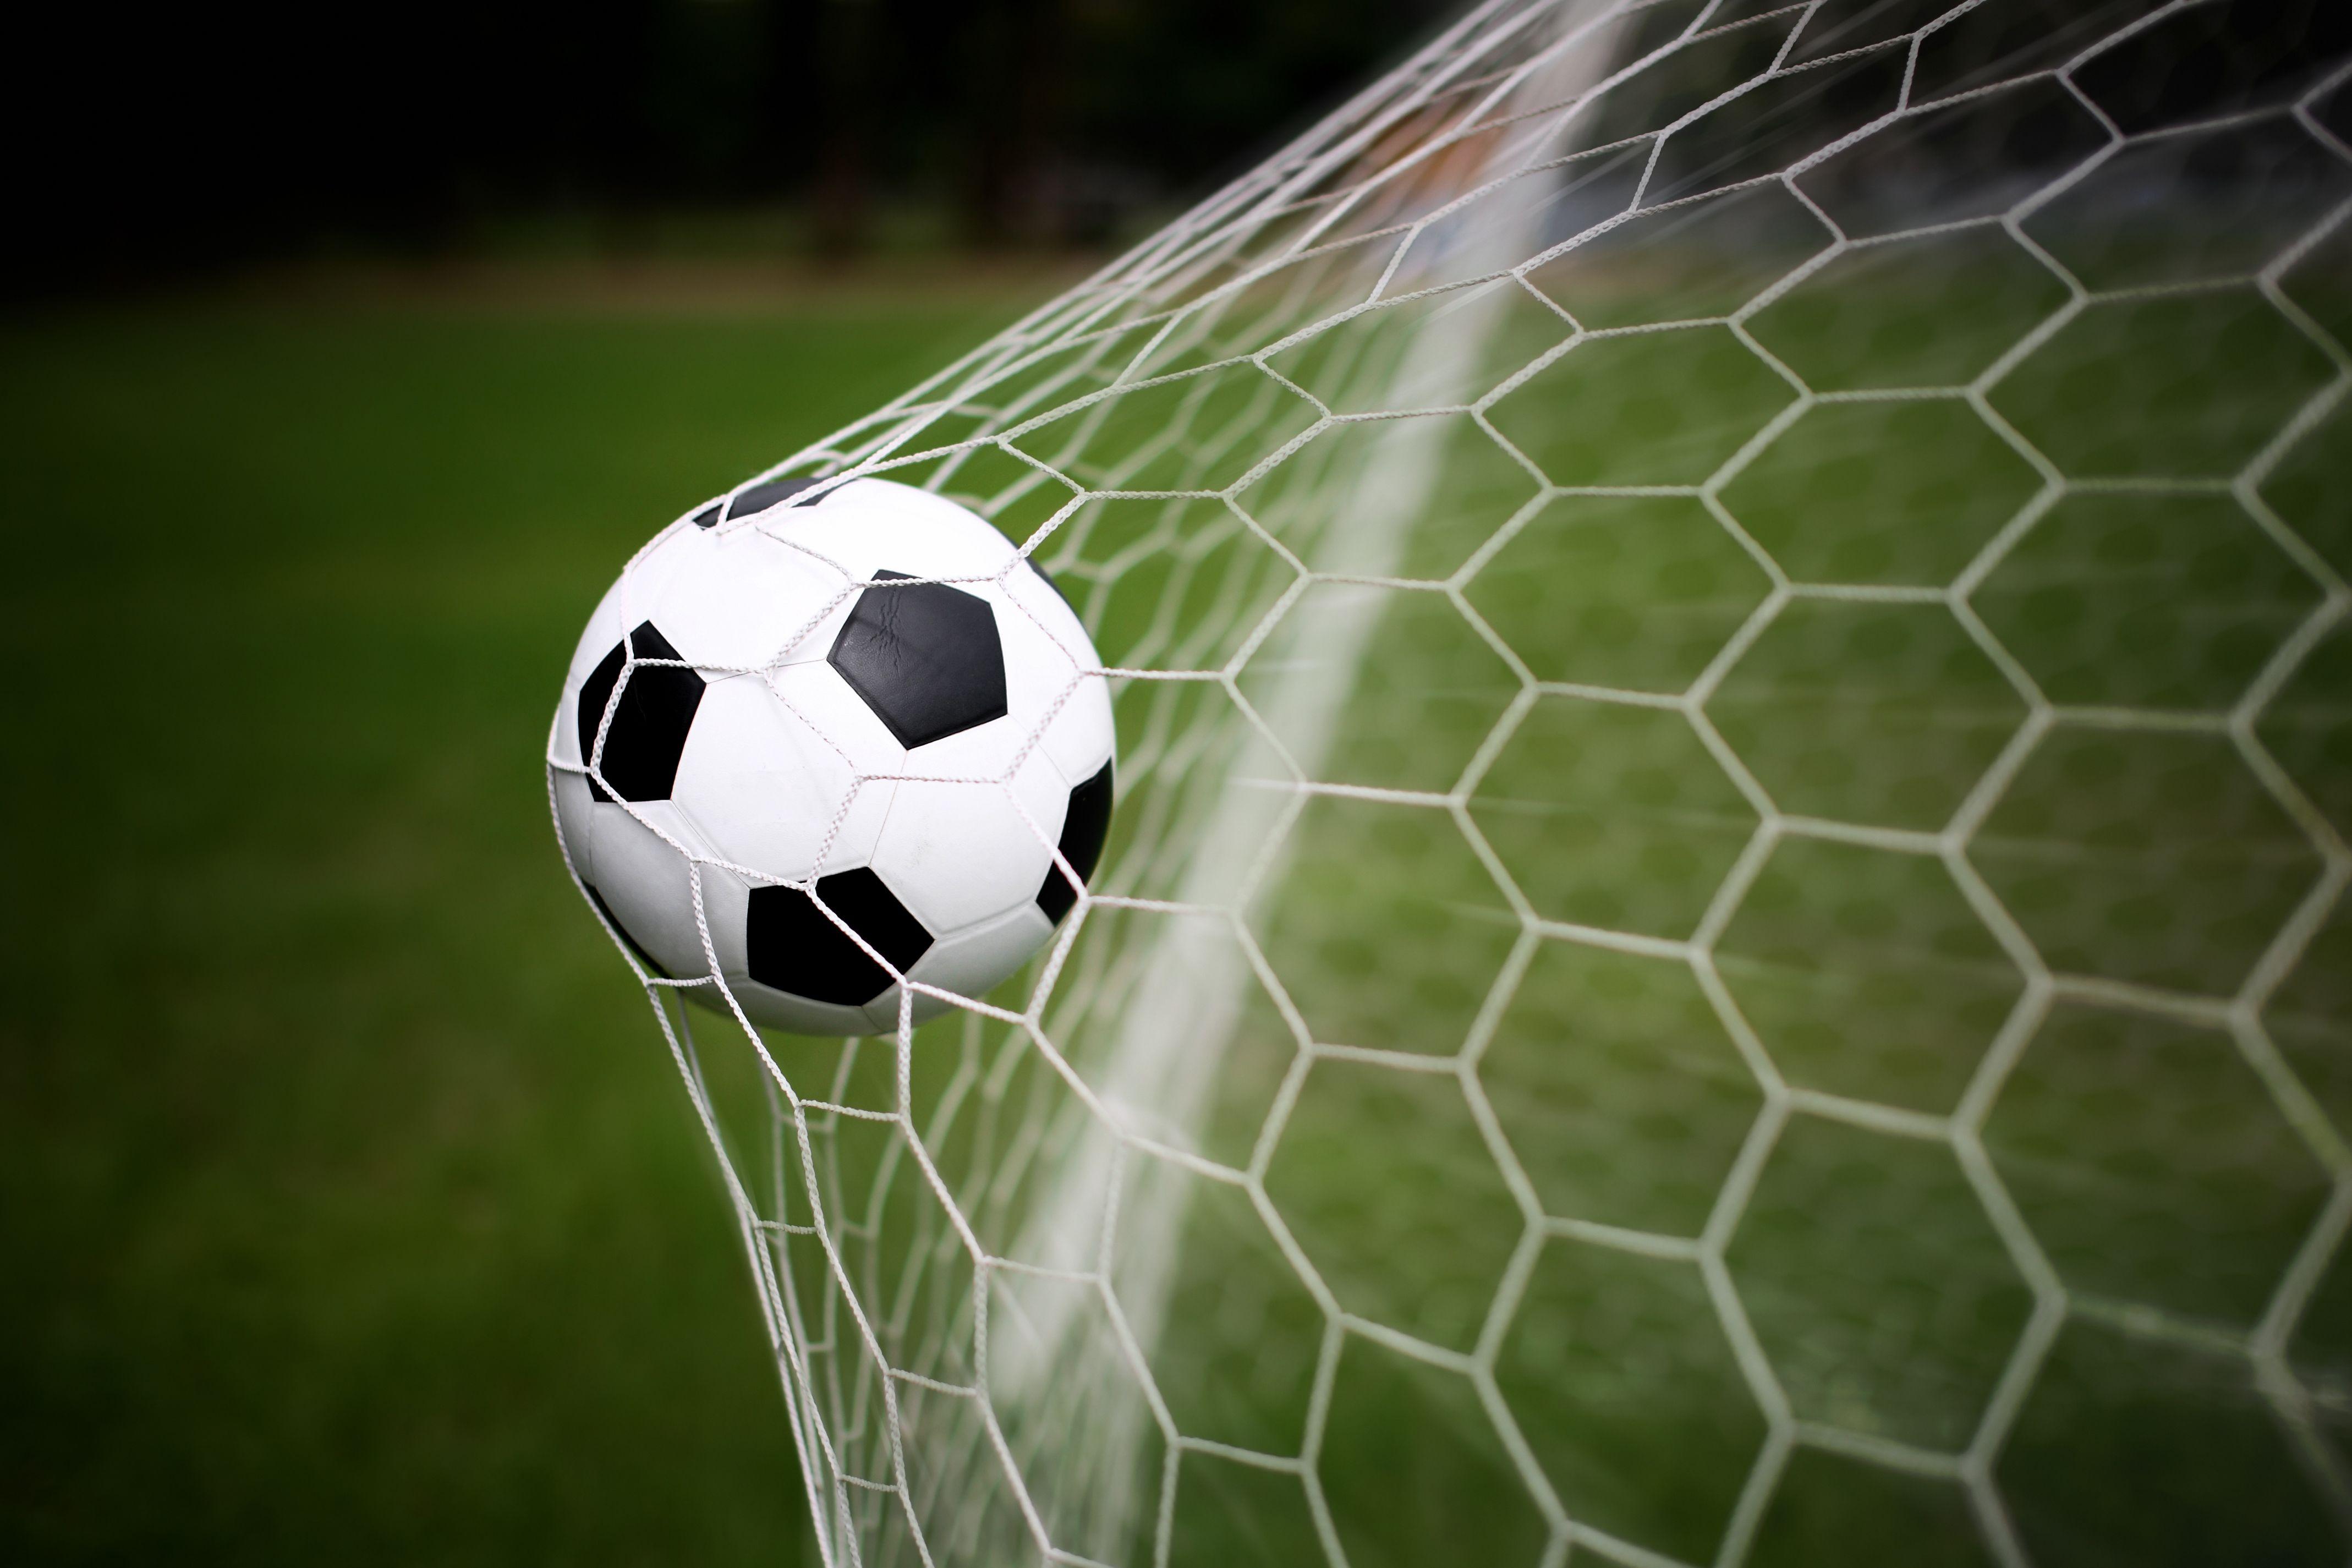 Soccer Ball In Goal Net Art Print Home Decor Wall Art Poster C